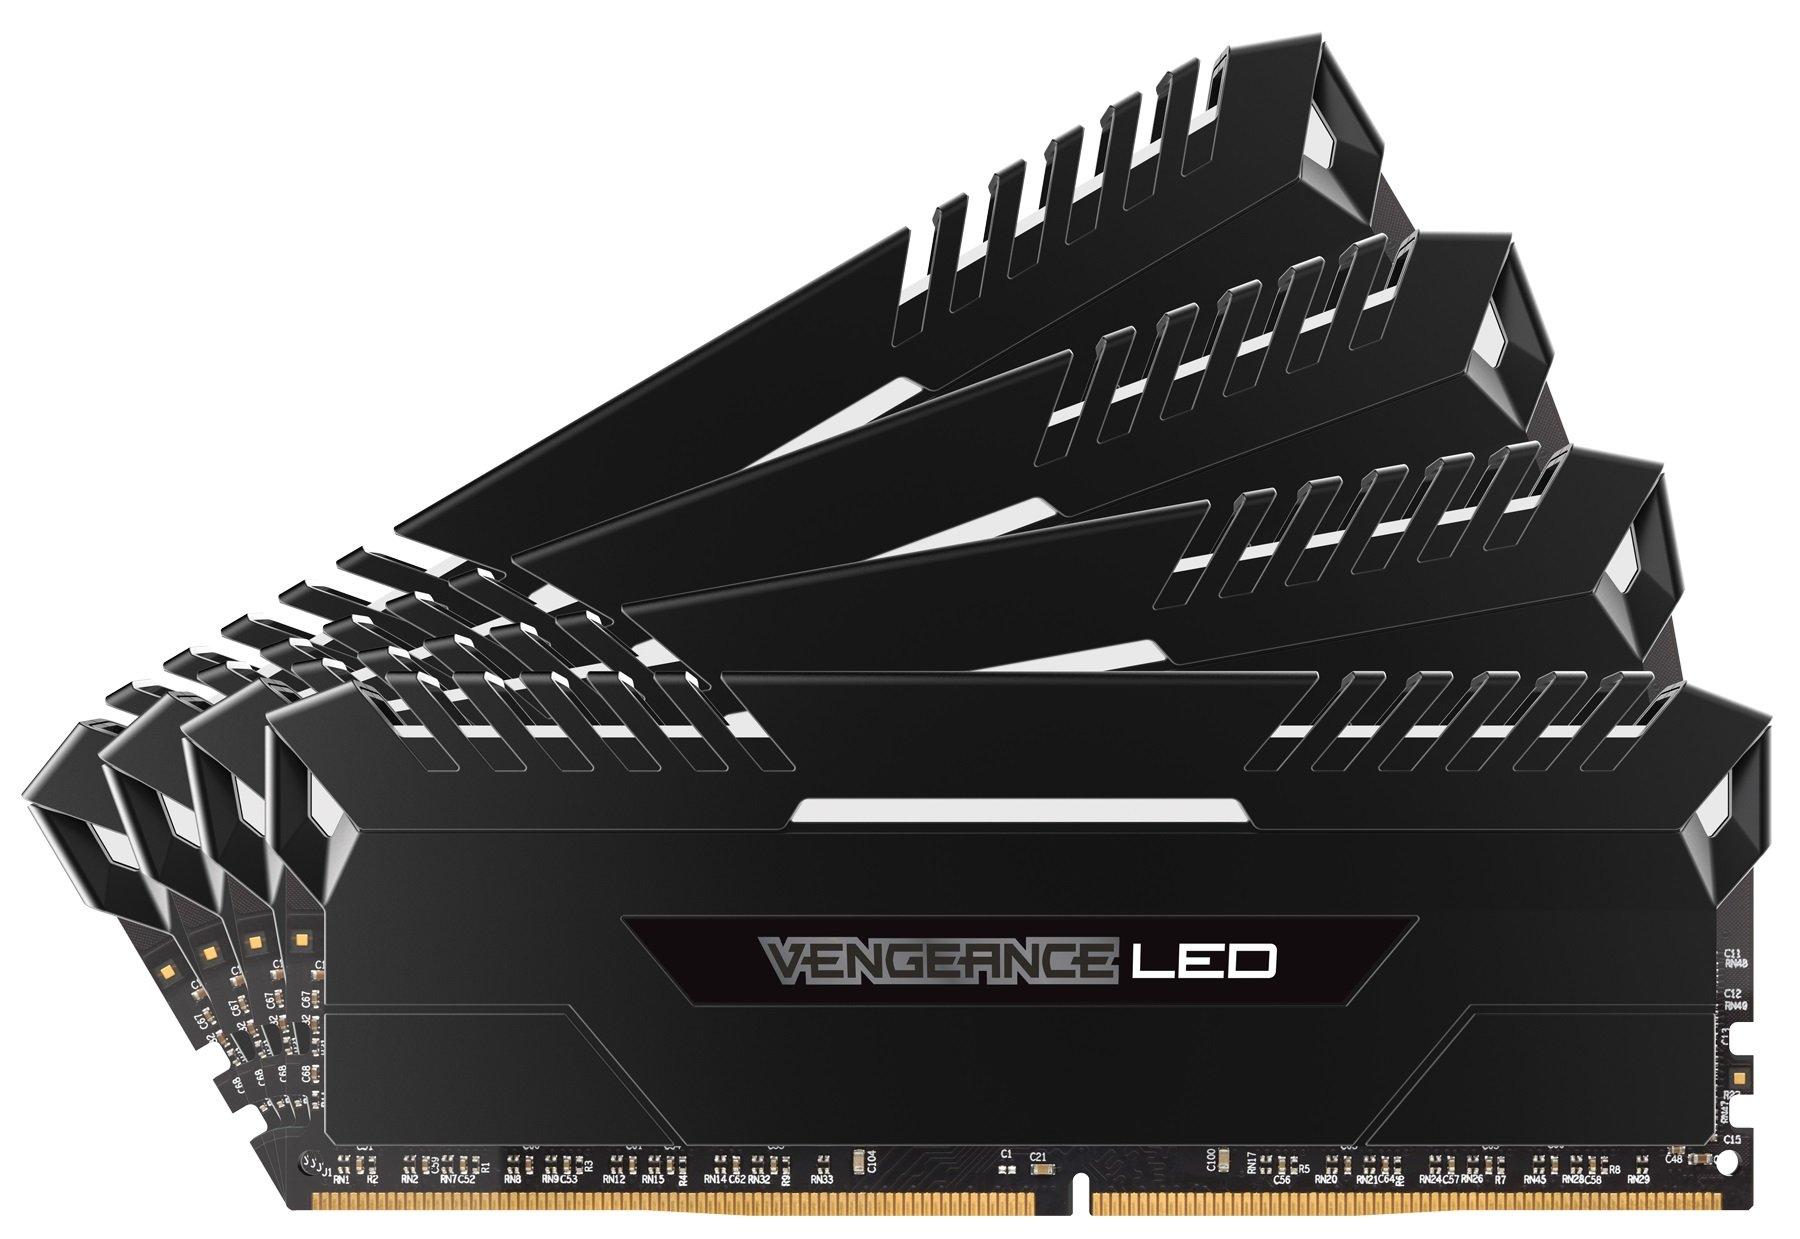 Corsair Vengeance 64GB (4x16GB) DDR4 3200 (PC4-25600) C16 for Intel 100, White LED (CMU64GX4M4C3200C16)